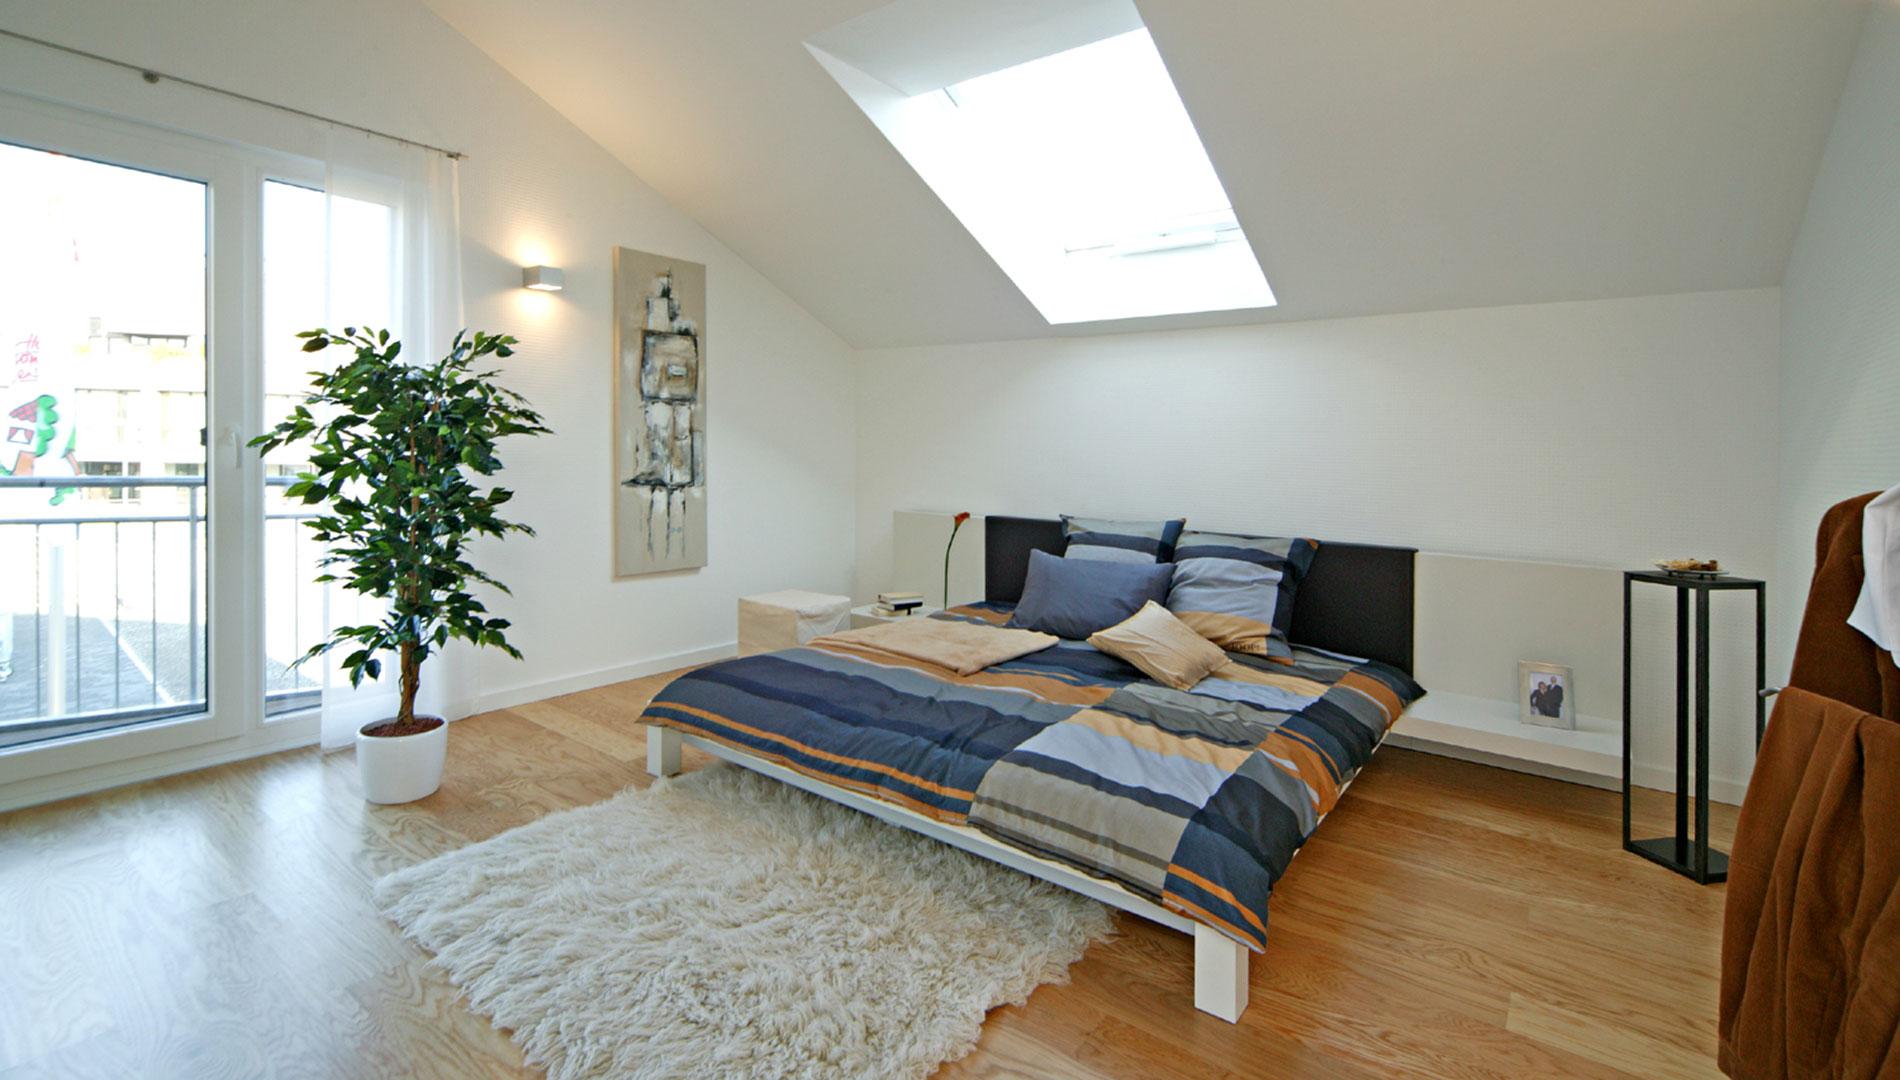 Musterhaus Villingen-Schwenningen - Schlafzimmer